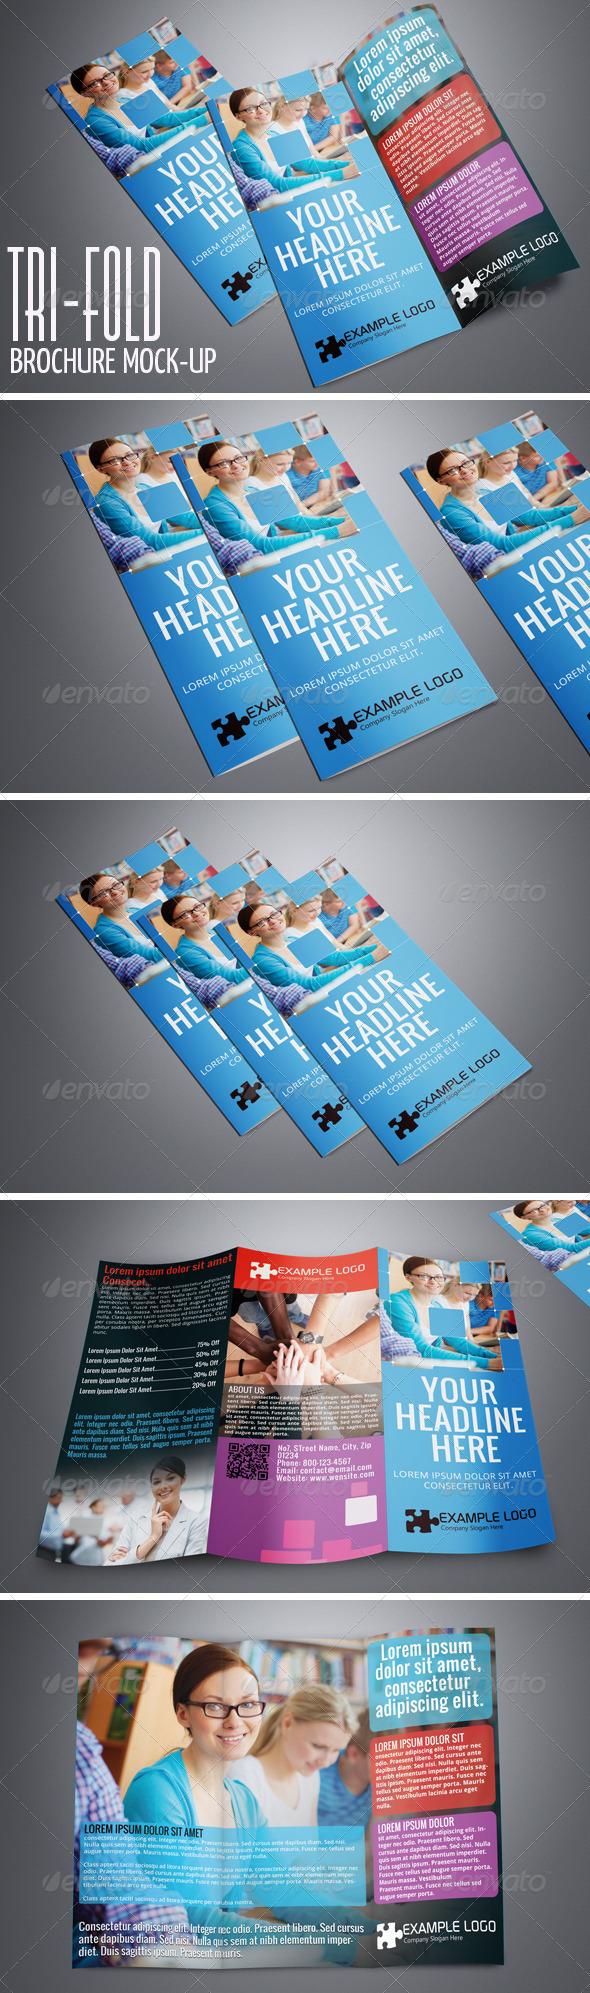 GraphicRiver Photorealistic Tri-Fold A4 Brochure Mock-up Vol.2 4927686